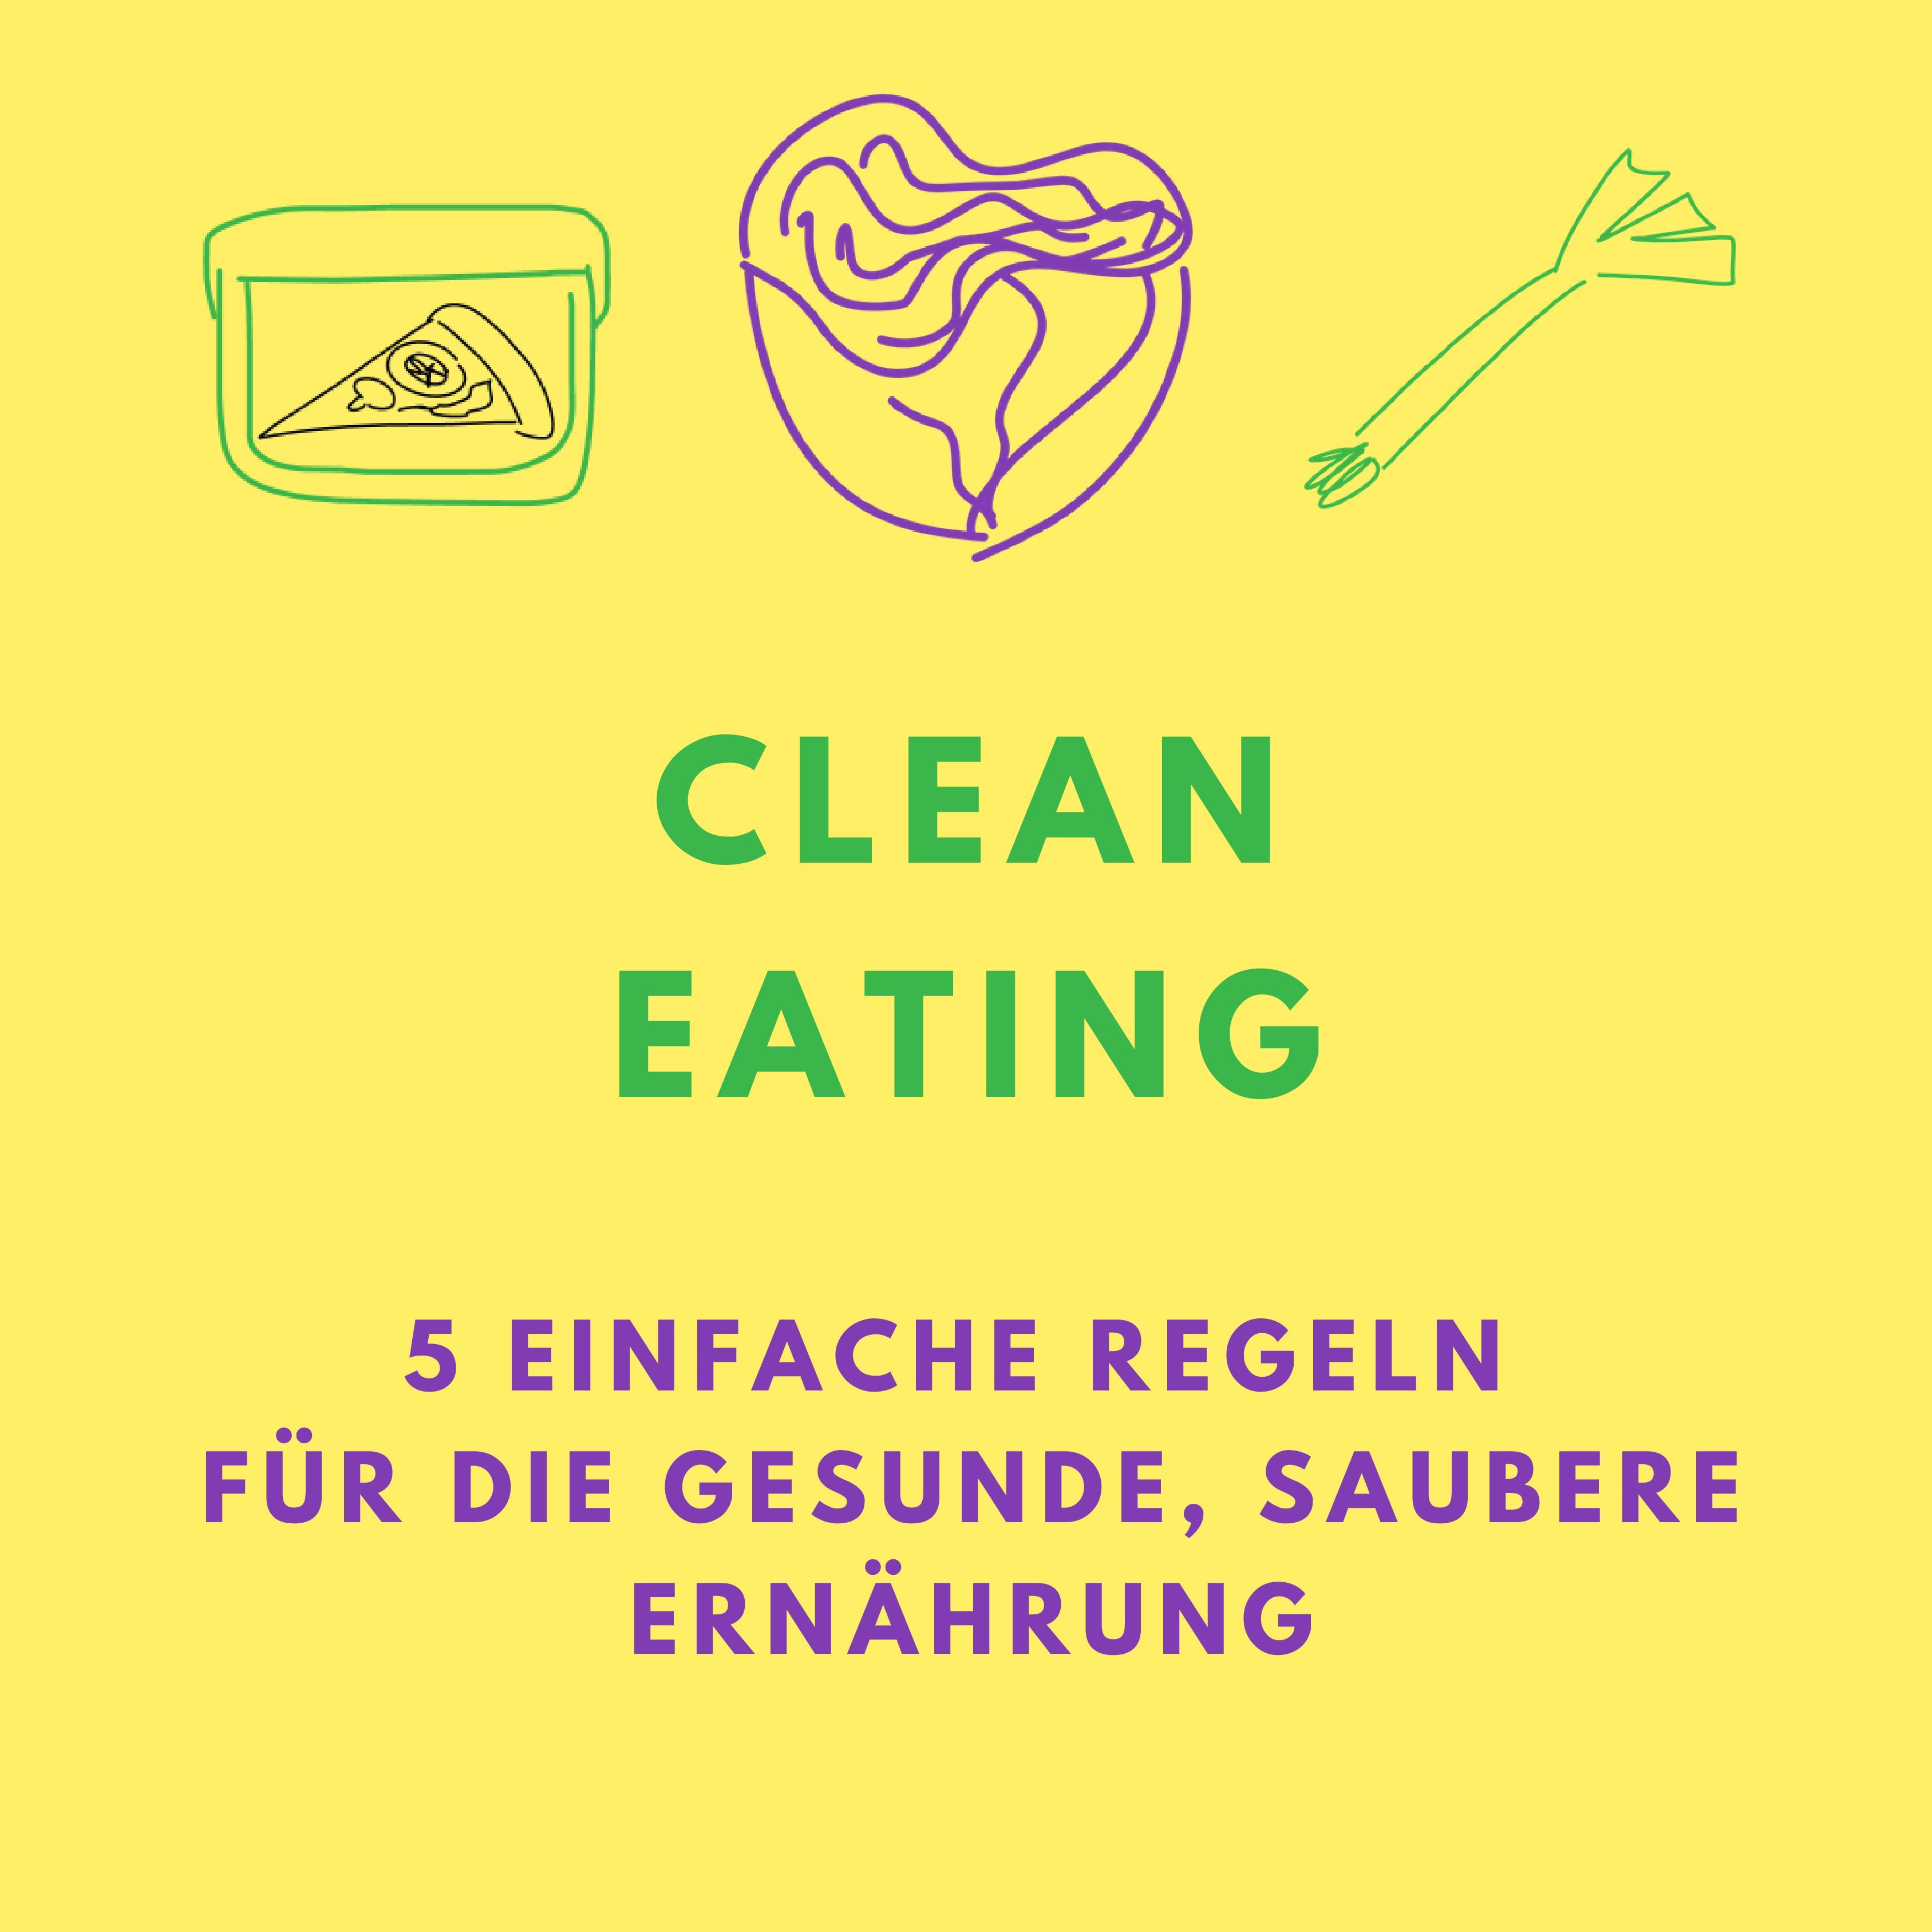 Clean Eating-Meal Prep-Meal Prep vegan-Ernährung für Vielbeschäftigte